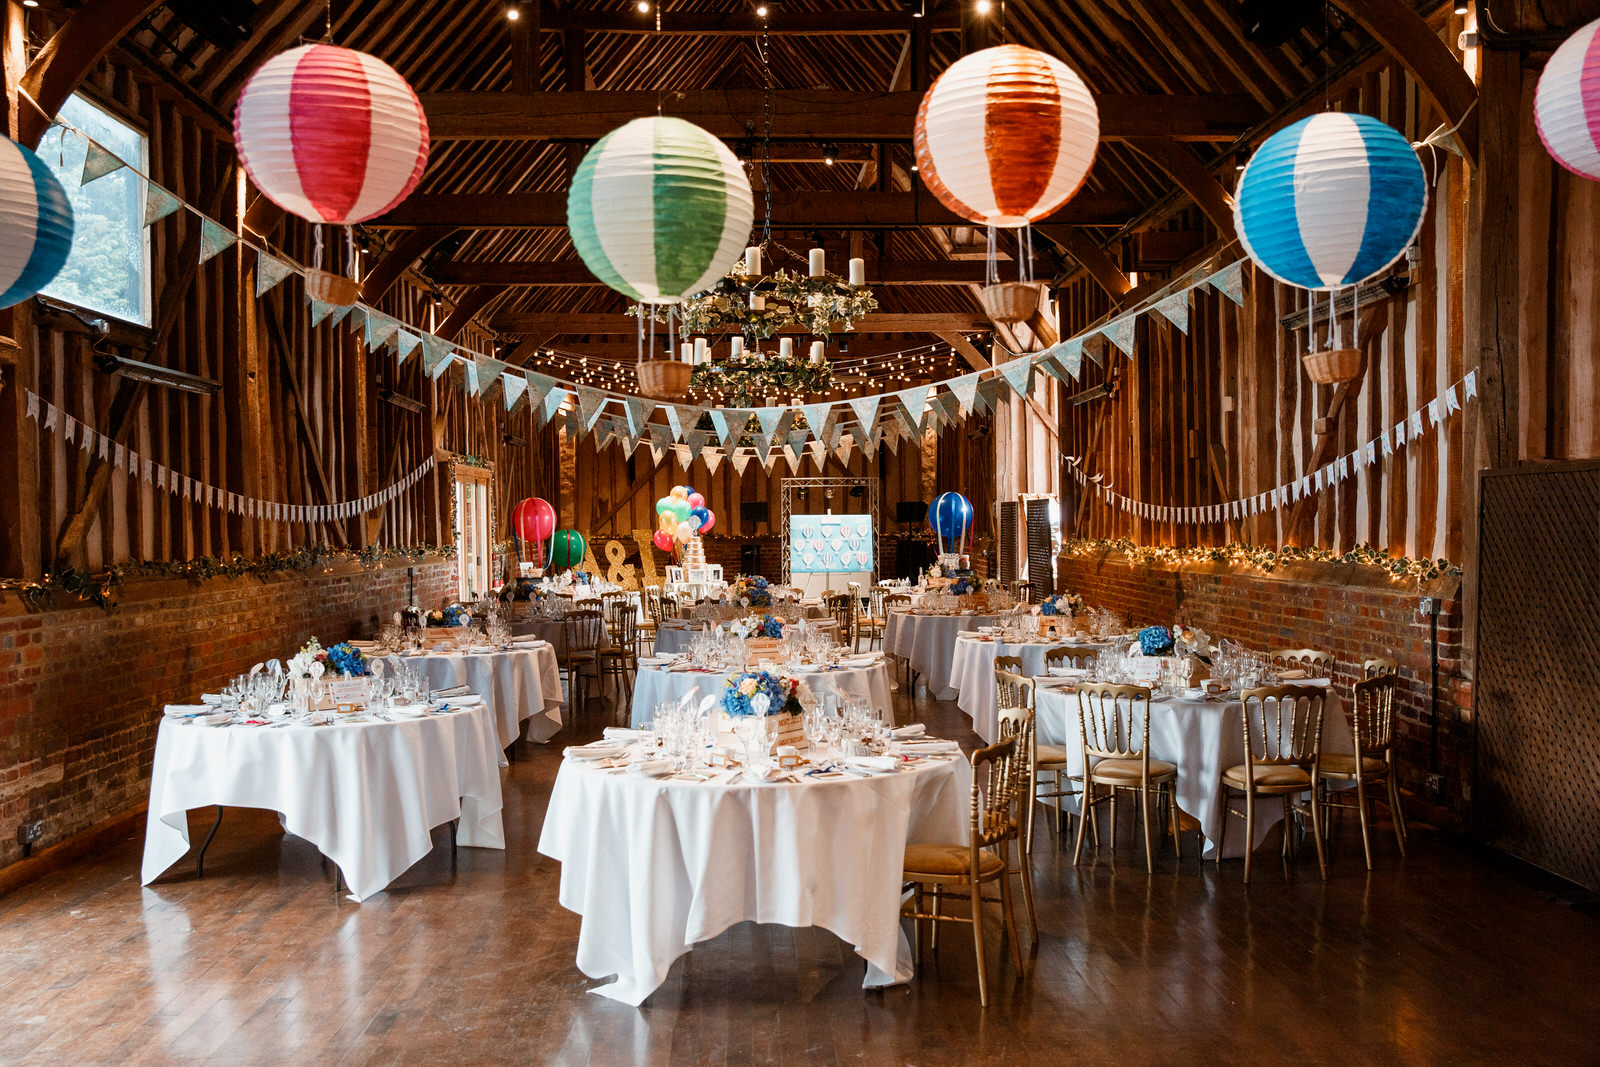 wedding breakfast room at lillibrooke manor wedding